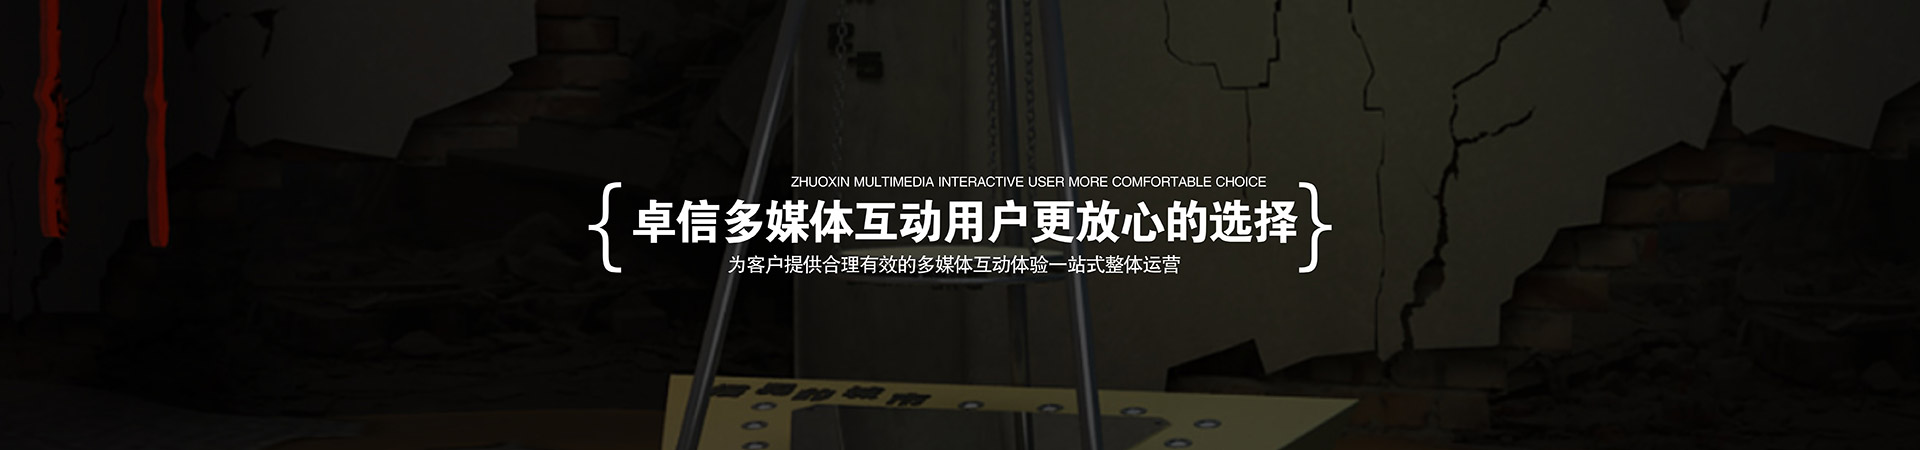 安全体验9DVR体验馆VR影院虚拟现实